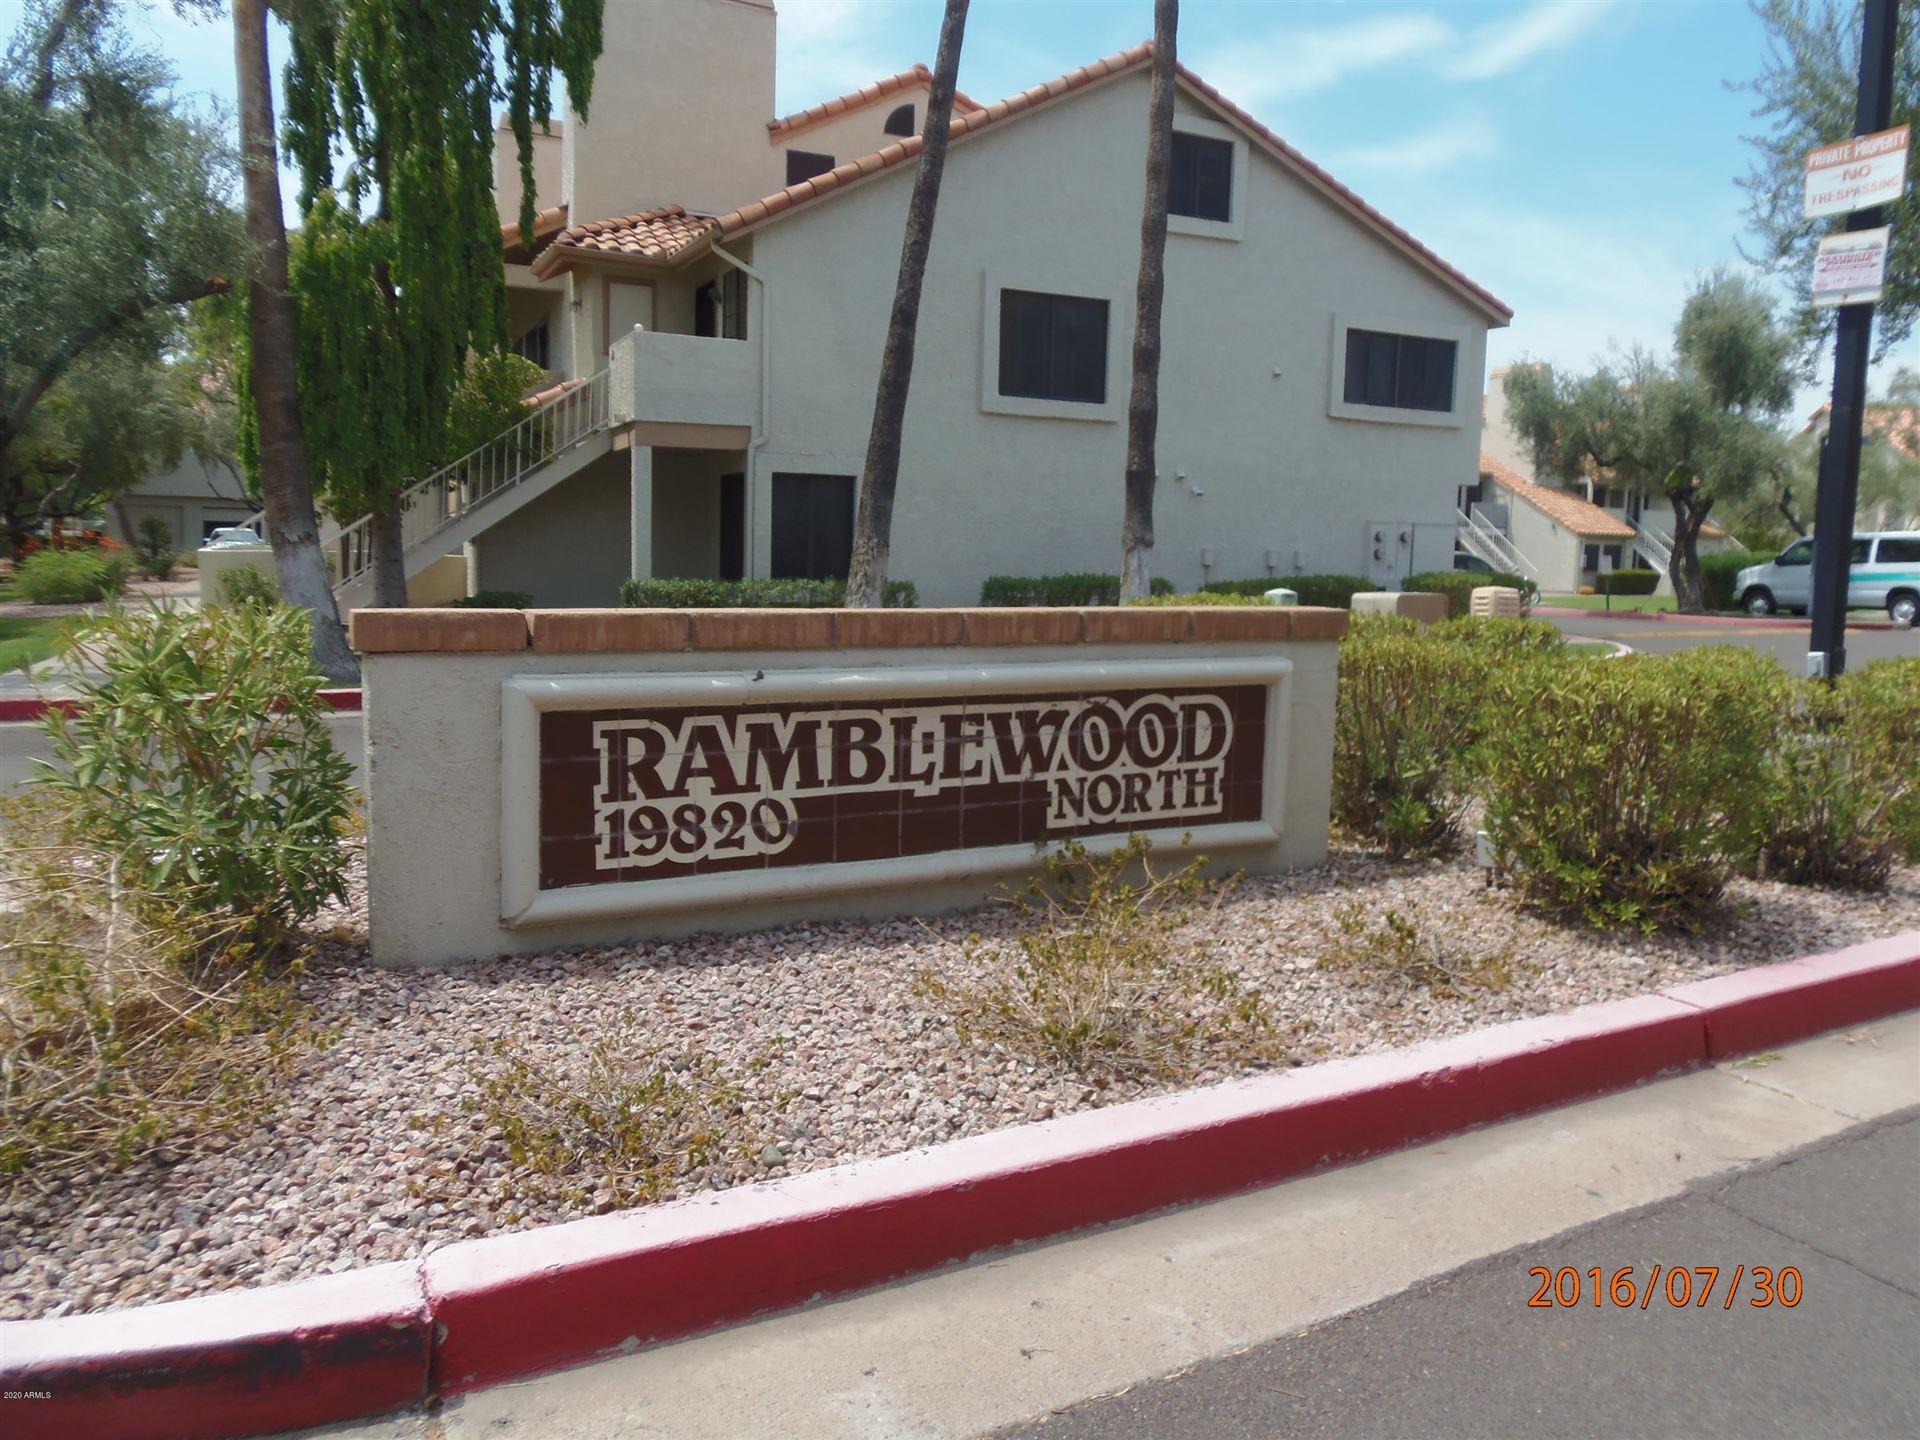 19820 N 13TH Avenue #263, Phoenix, AZ 85027 - #: 6087000